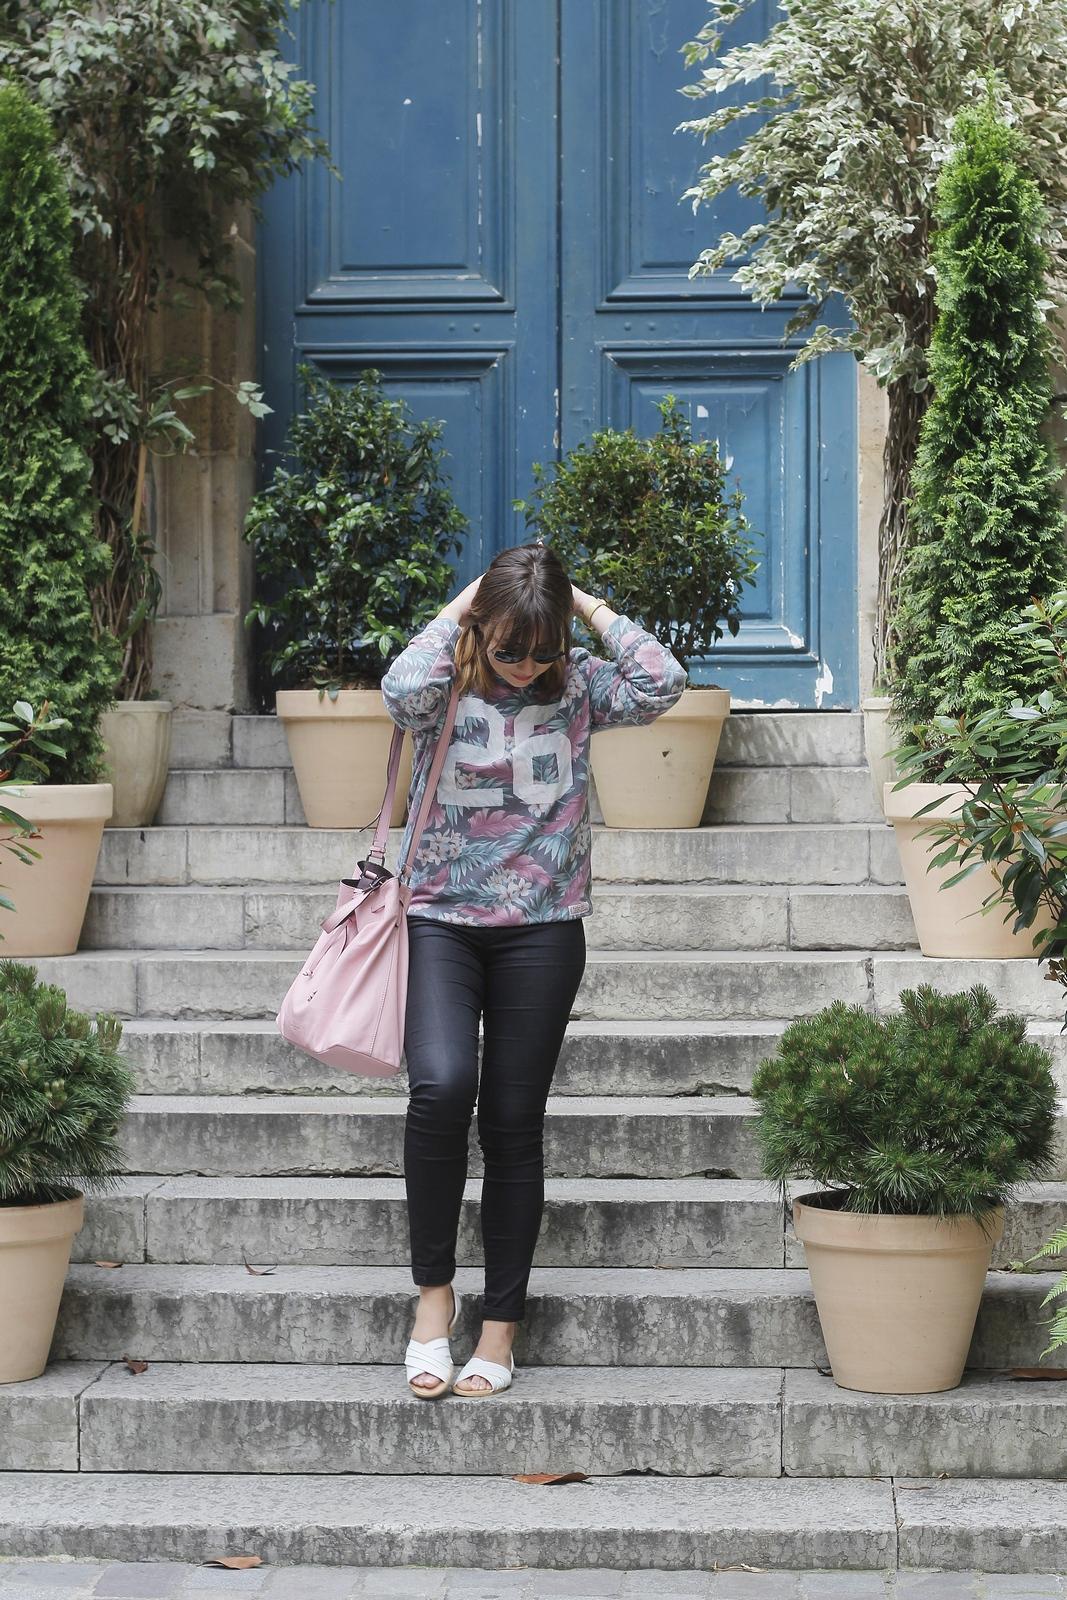 Blog mode femme Paris - Du style, Madame - streetstyle - tropical - kaporal